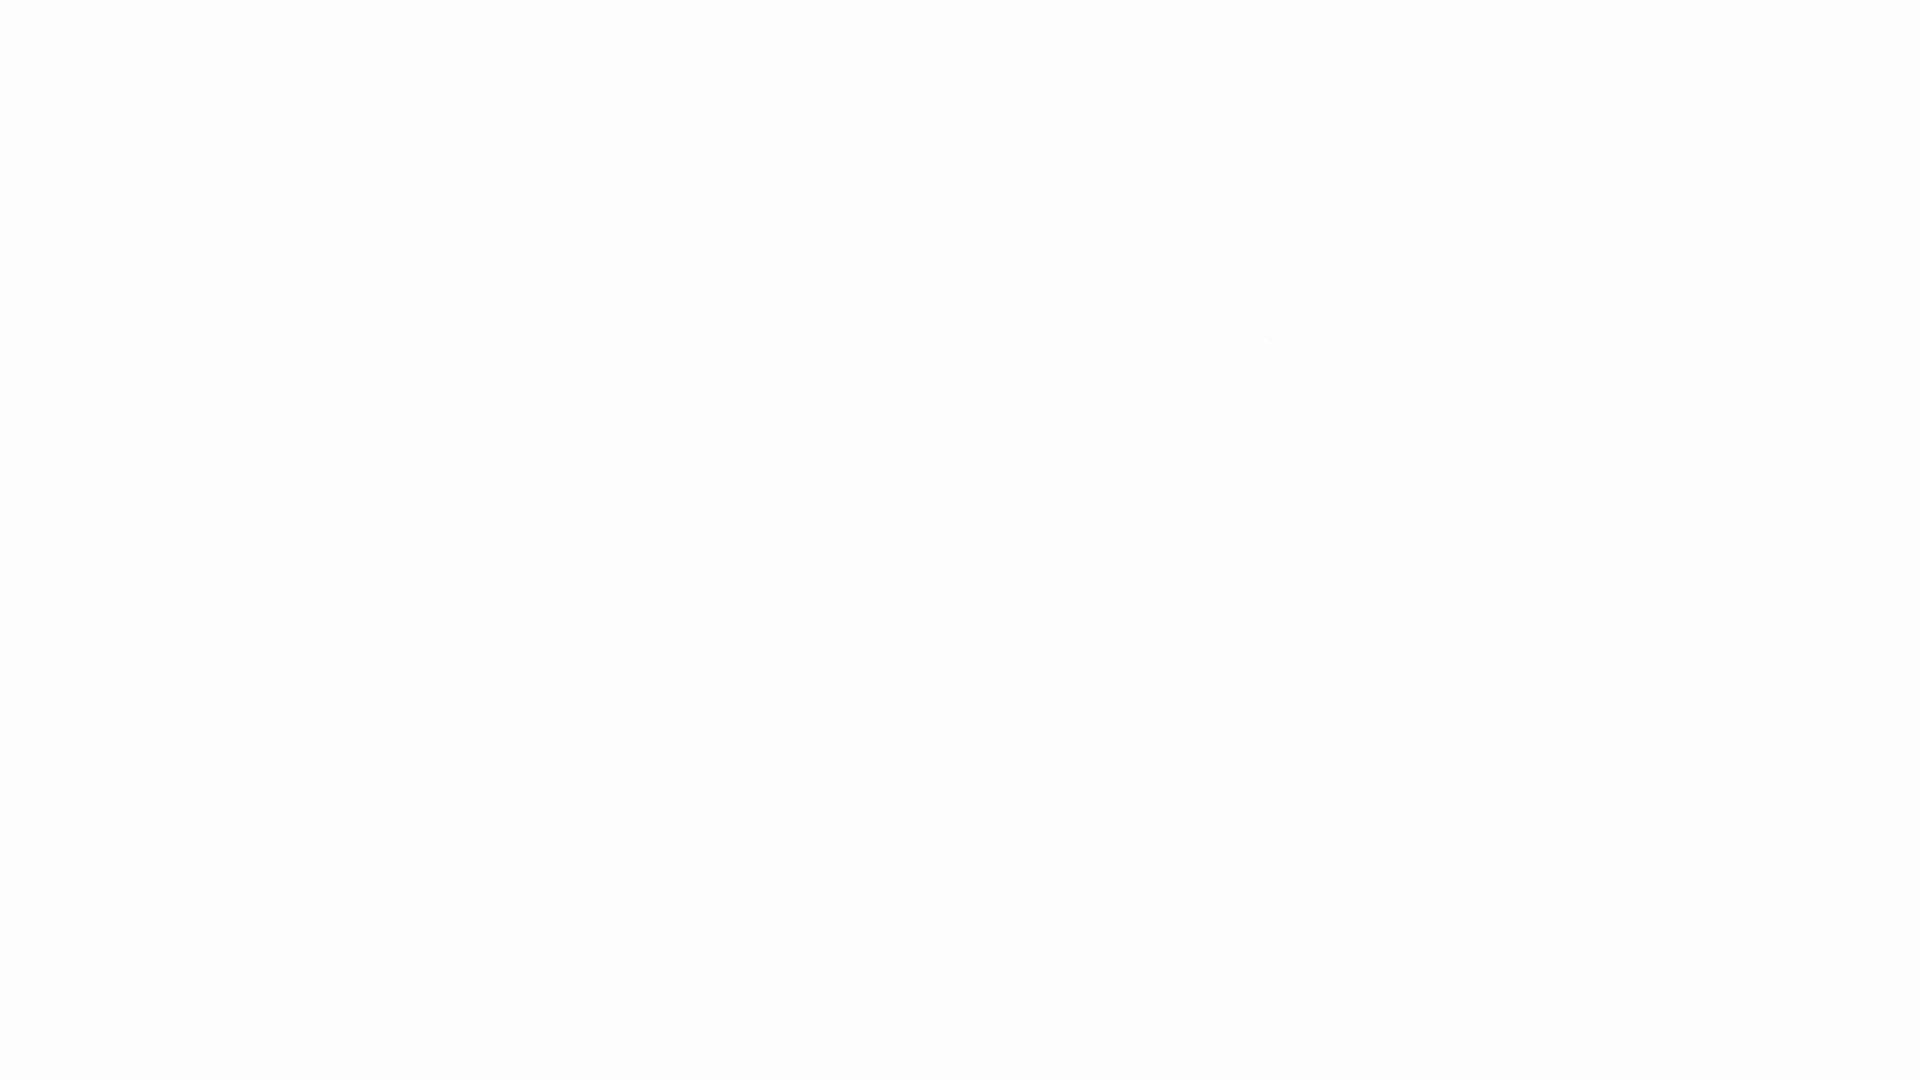 上級者の方専用 vol.03 盗撮シリーズ  102PIX 66